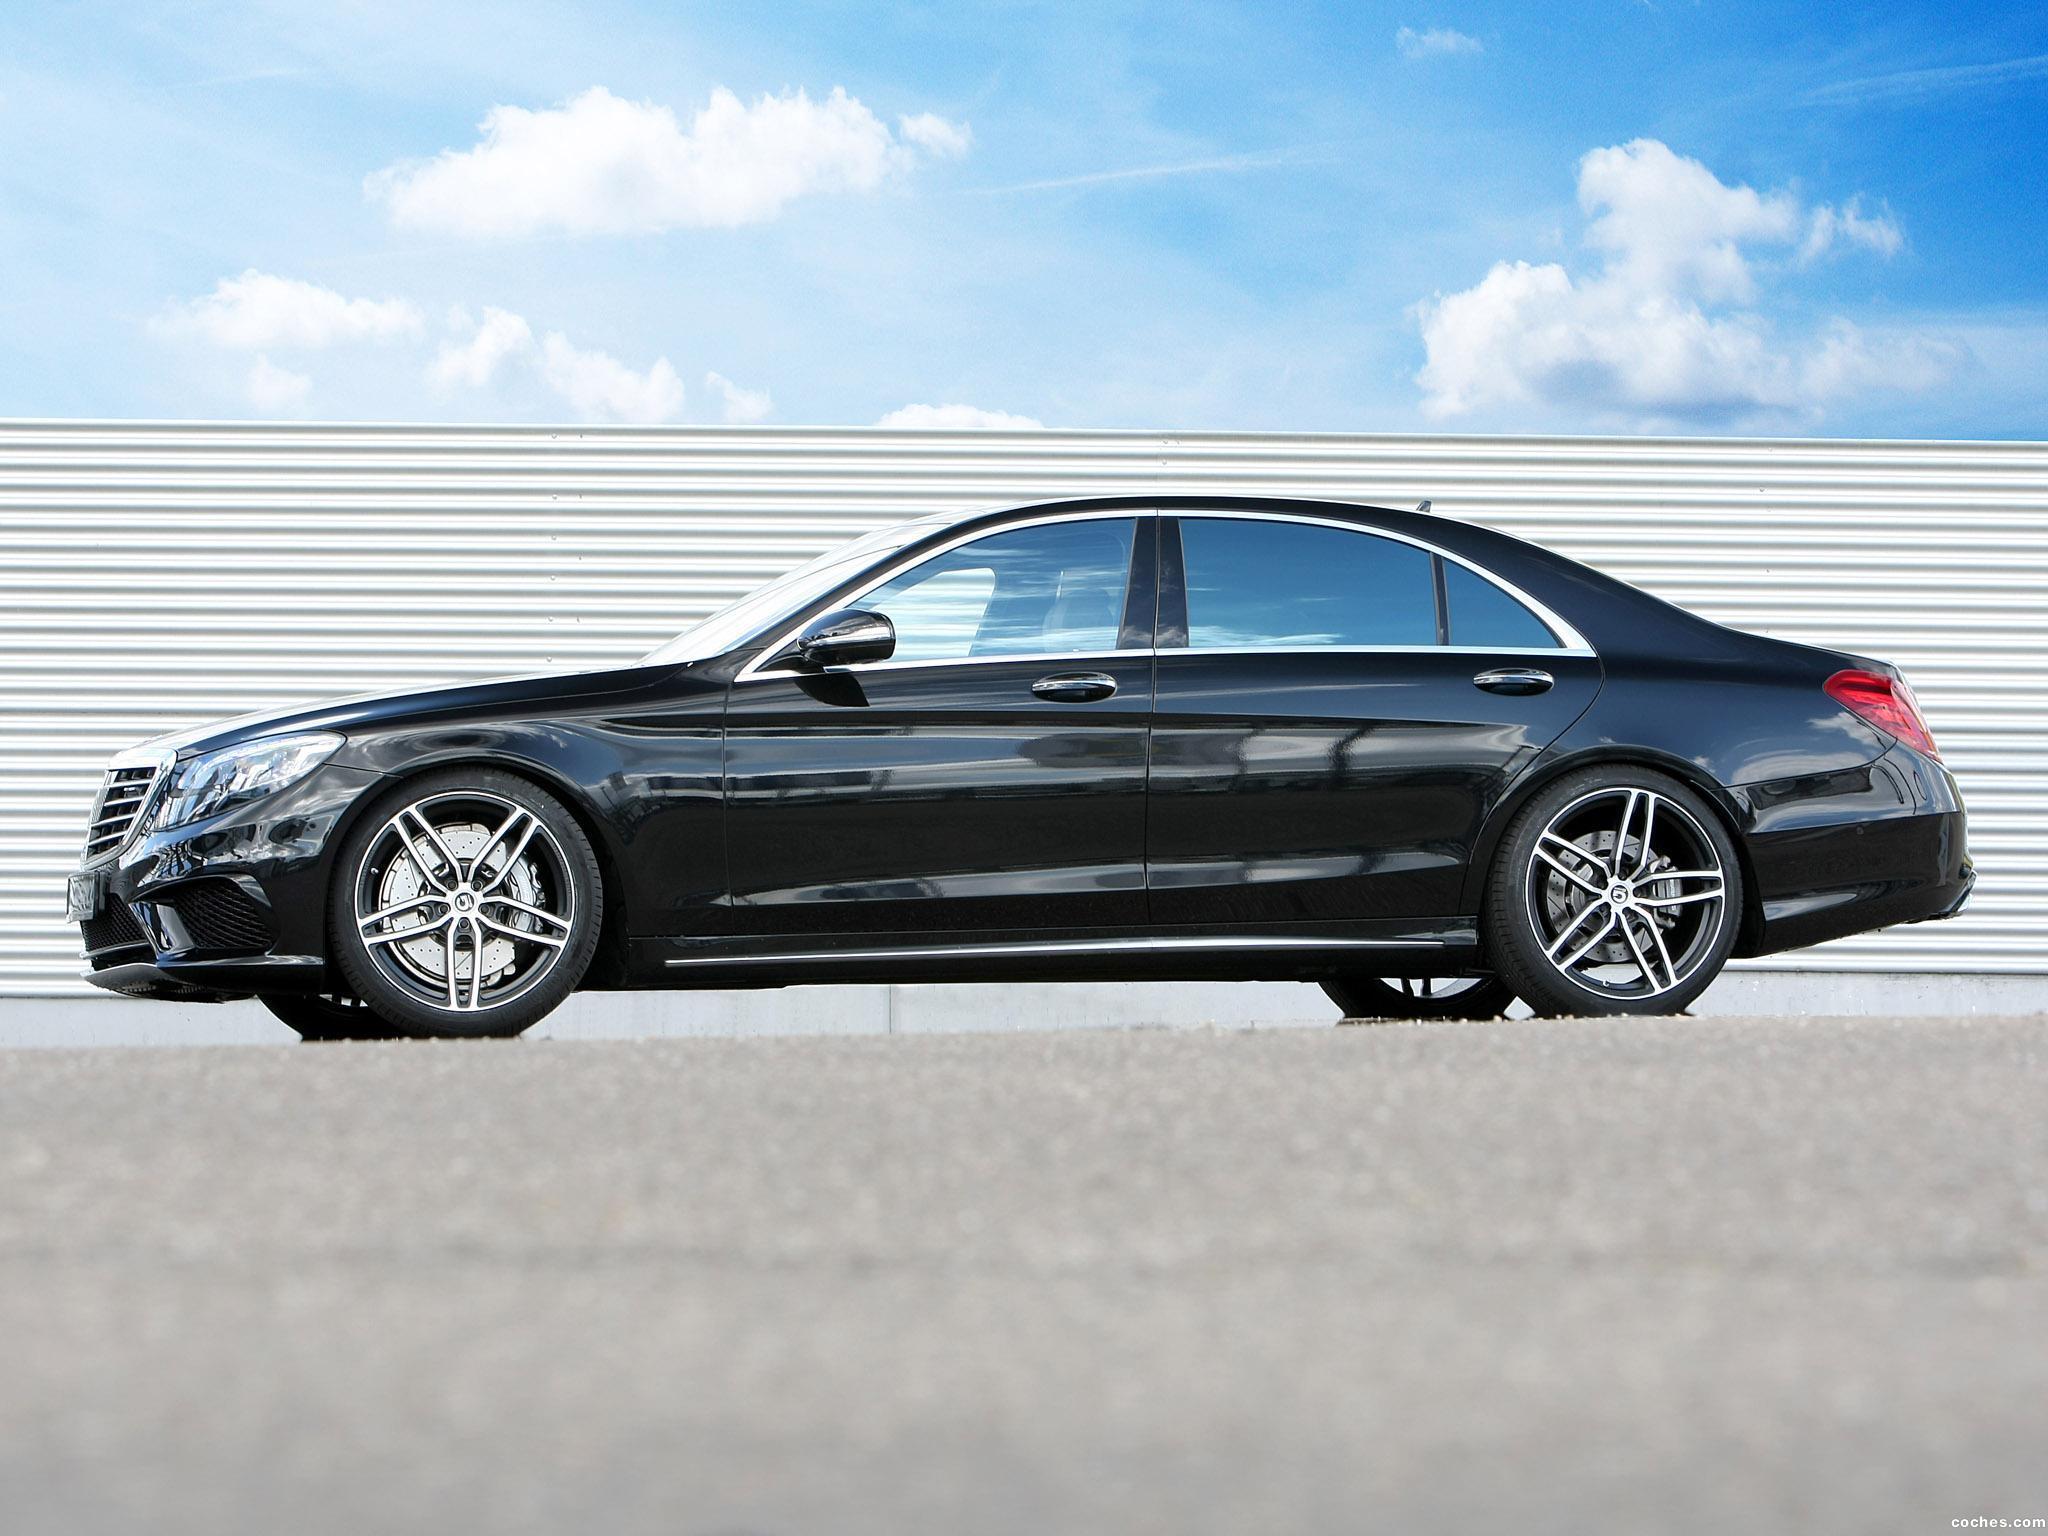 Foto 2 de G-power Mercedes AMG S63 Lang V222 2015